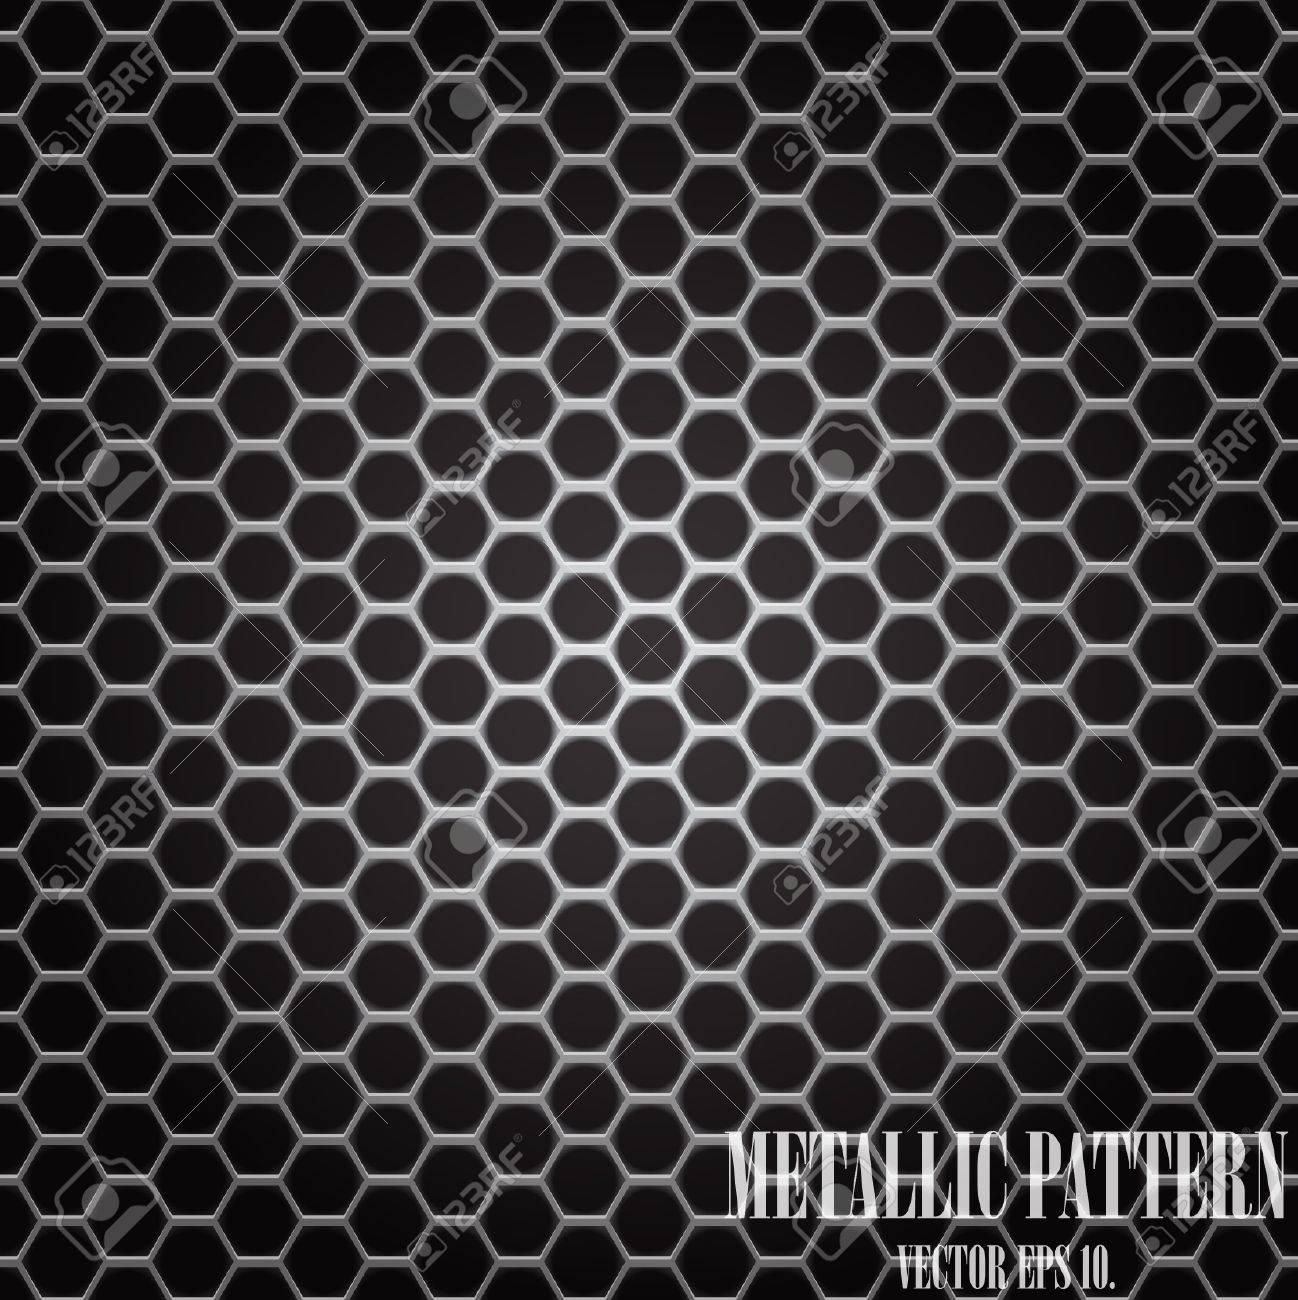 Abstract Metallic Background nIllustrator Stock Vector - 18251544